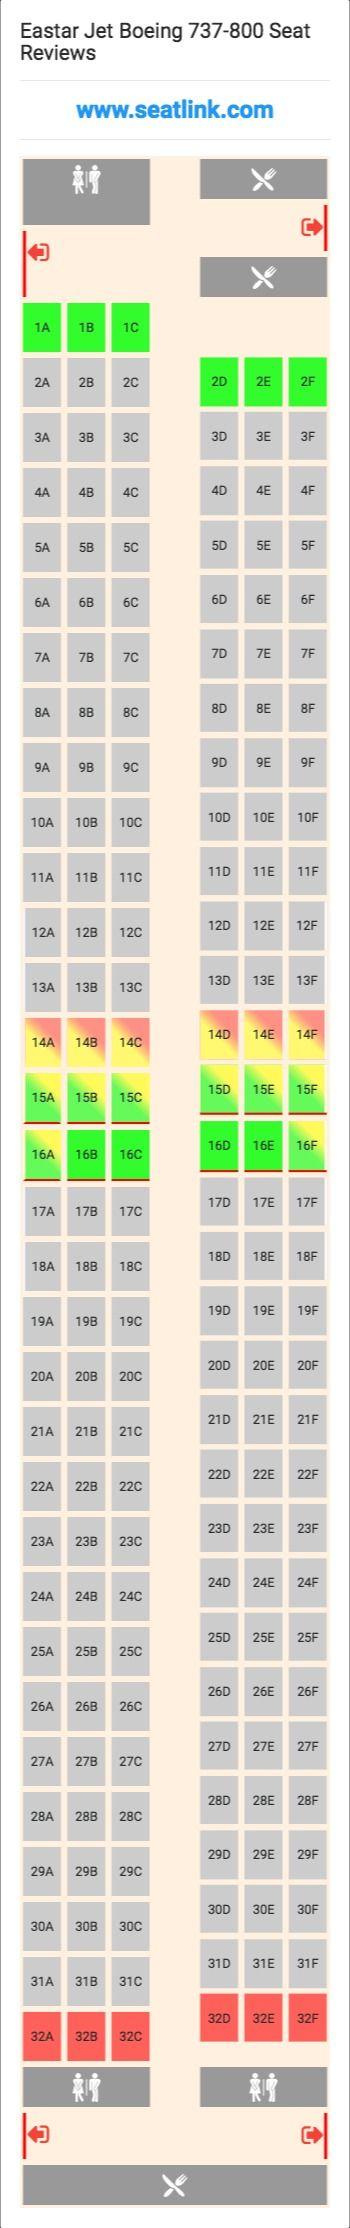 Eastar Jet Boeing 737-800 (738) Seat Map